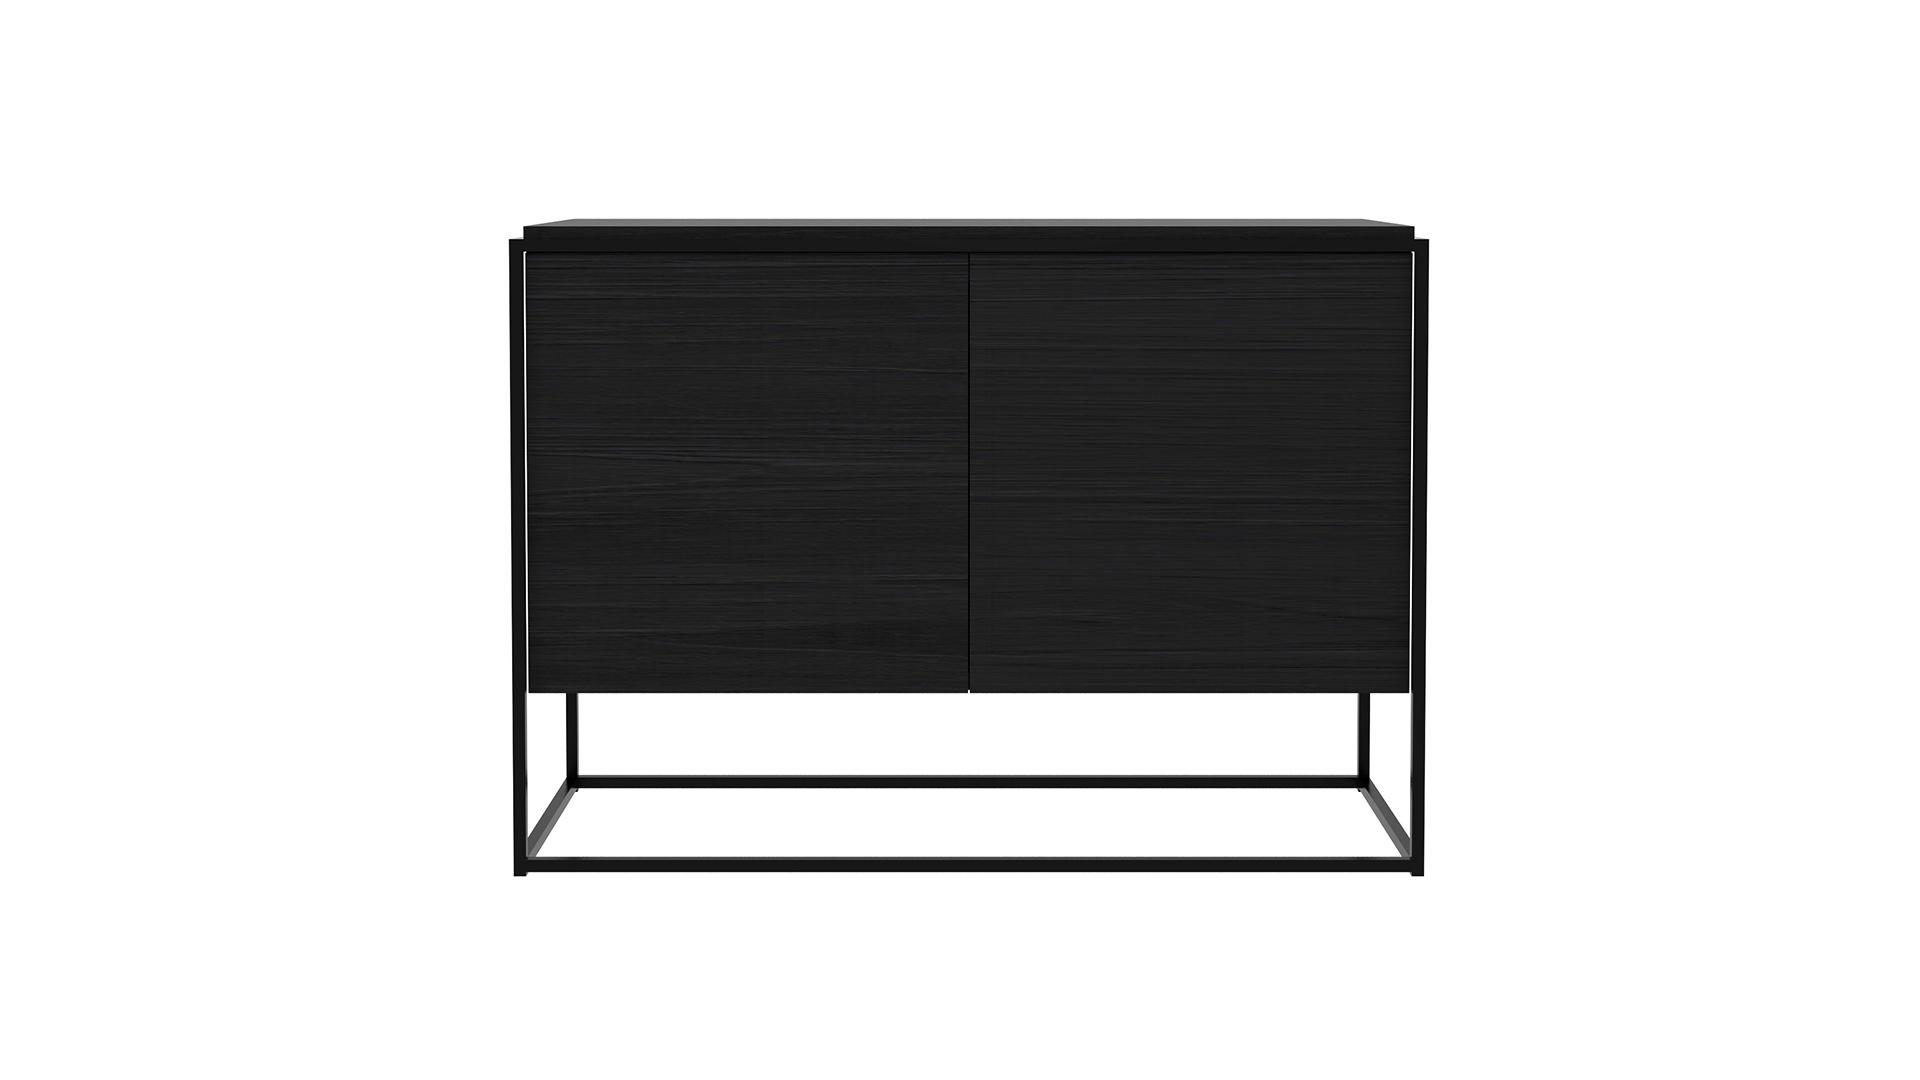 Ethnicraft-Monolit-cupboard-Black Oak black-frame